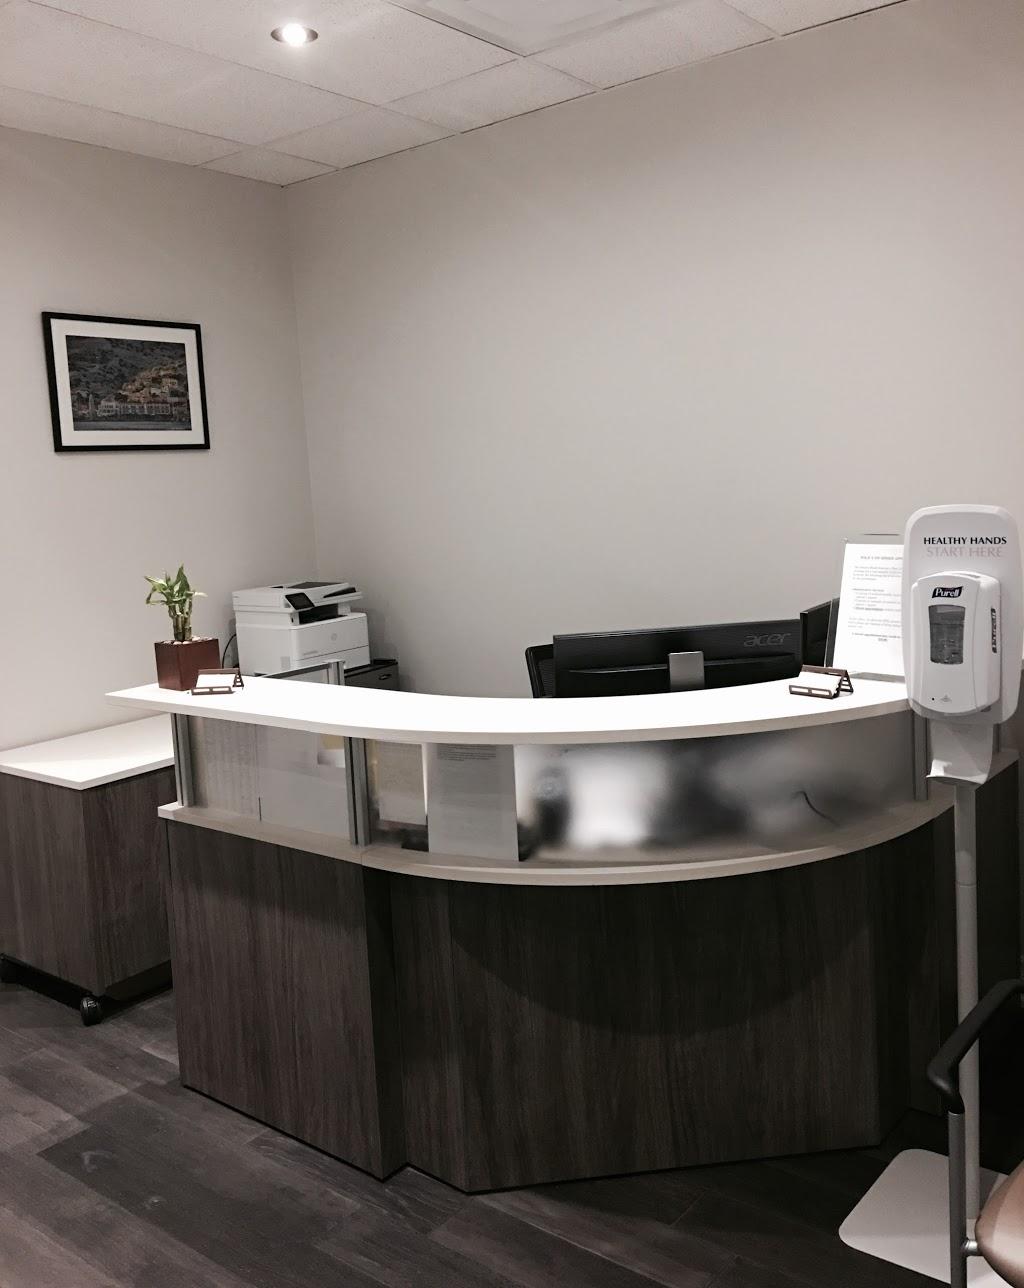 Dr. Alisha Razack FAMILY PHYSICIAN   doctor   751 Pape Ave #204, Toronto, ON M4K 3T1, Canada   4165190744 OR +1 416-519-0744